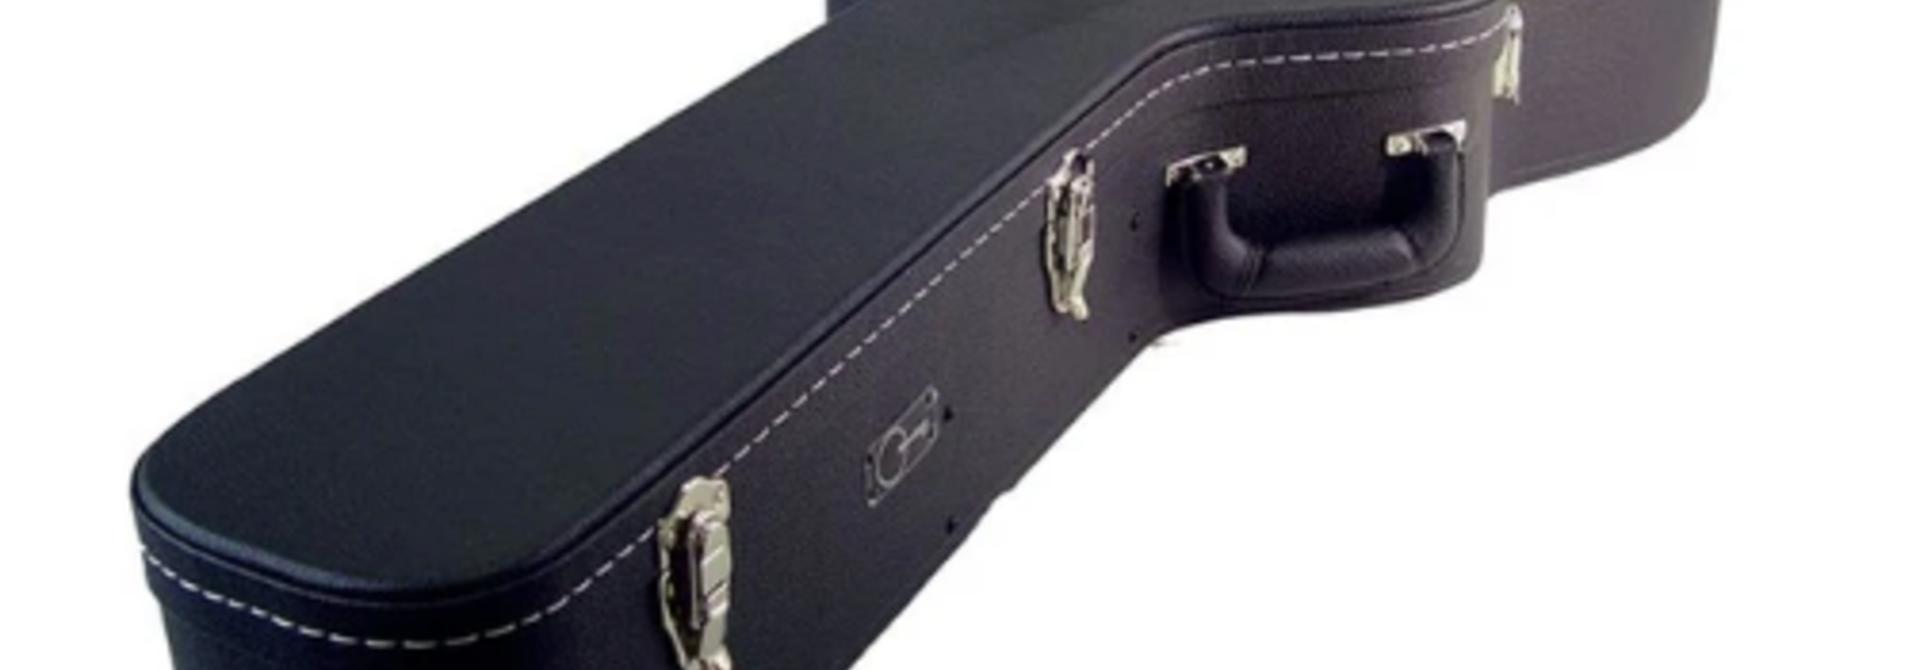 ProRockGear Phenom Series Dreadnaught Case